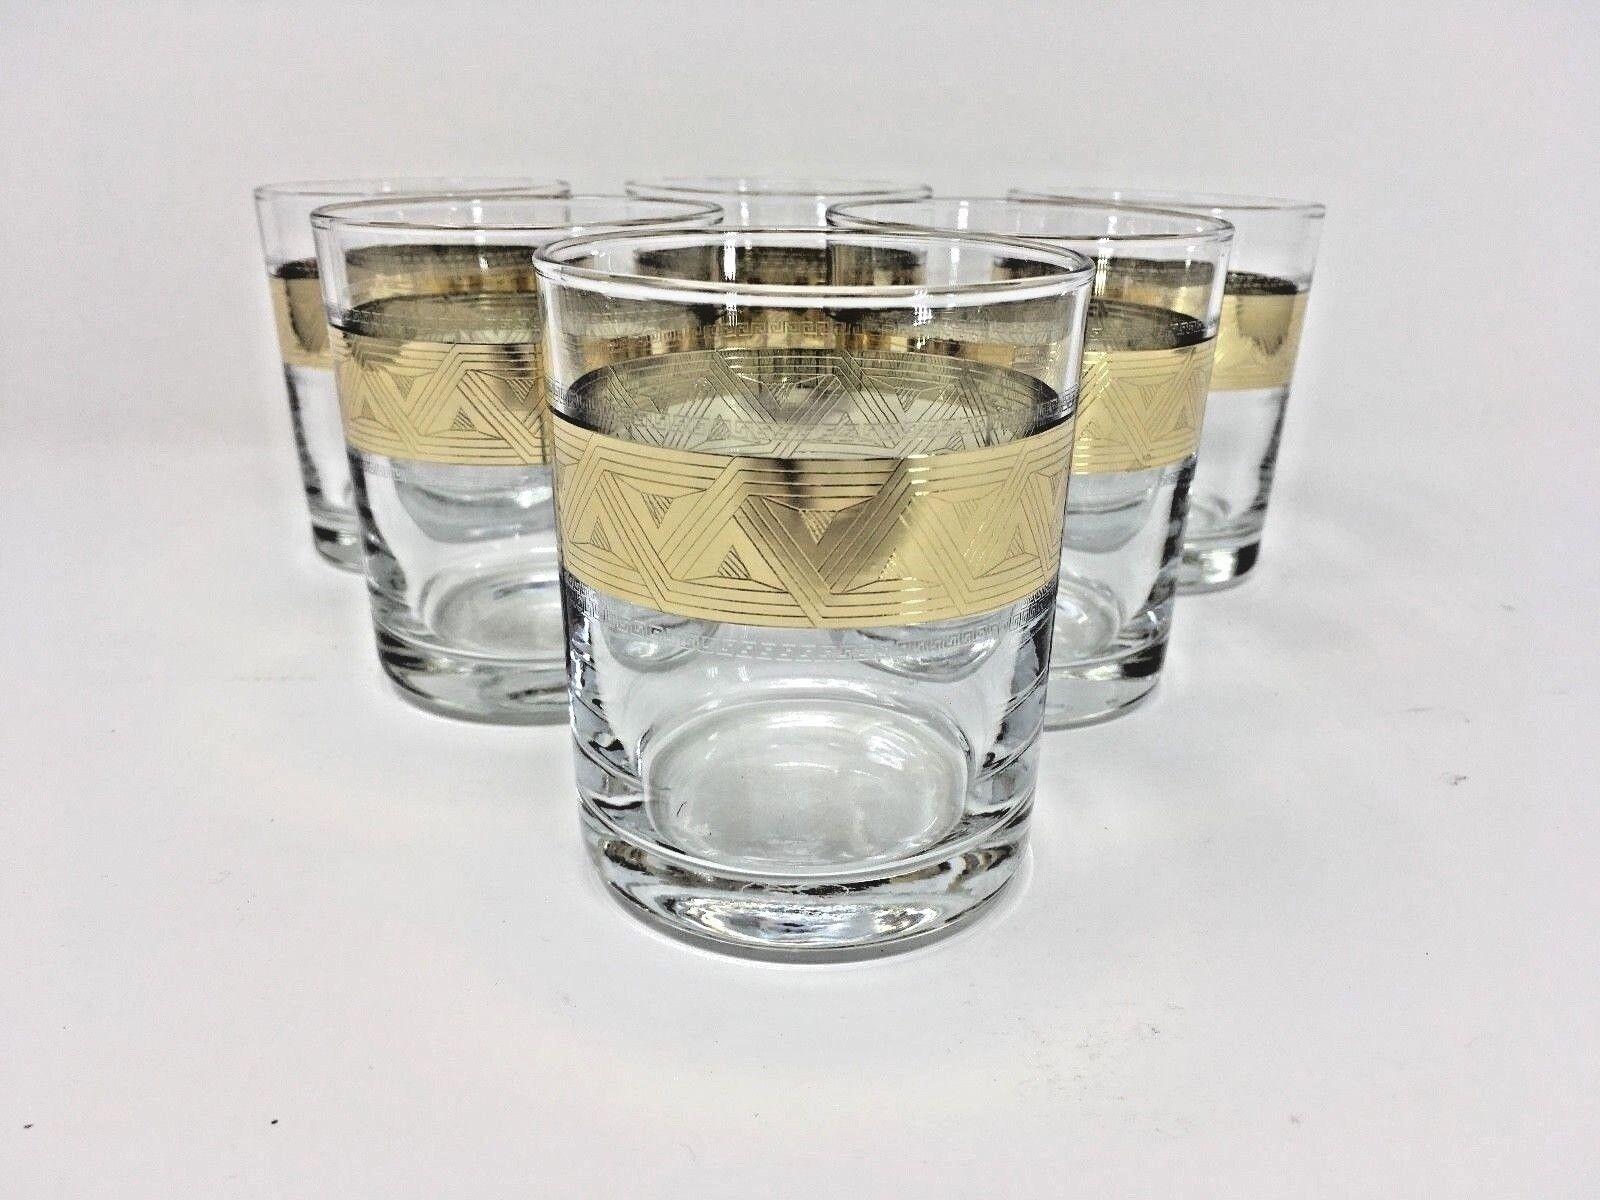 Crystal Glass Set of 6 Tumblers  7 oz  Whisky Cognac gold Rimmed Design